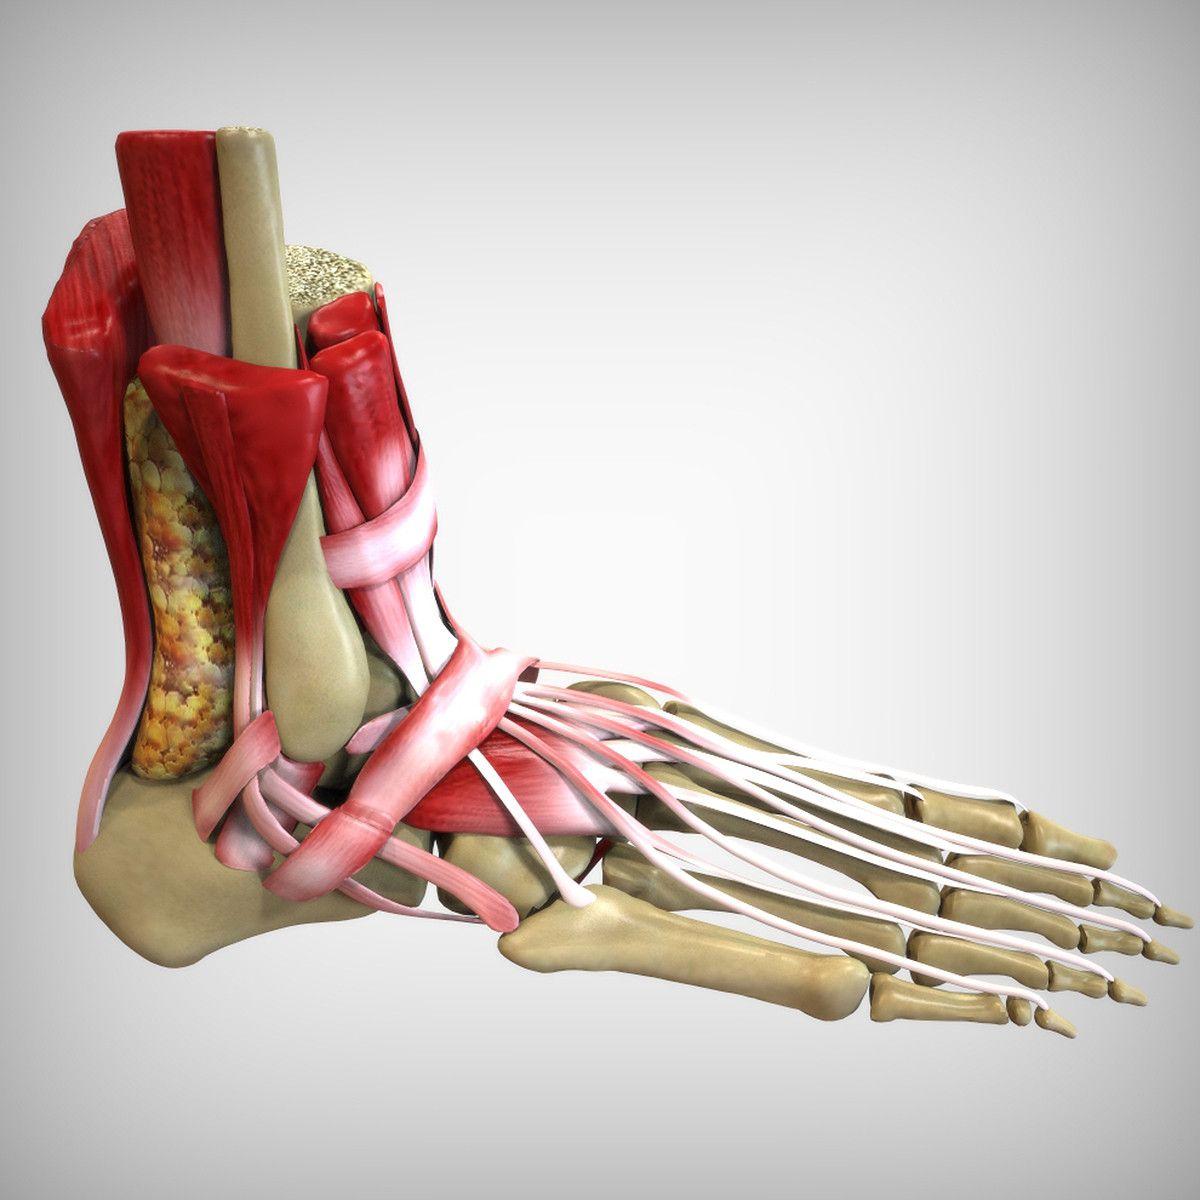 human foot anatomy 3d model   3d printing   Pinterest